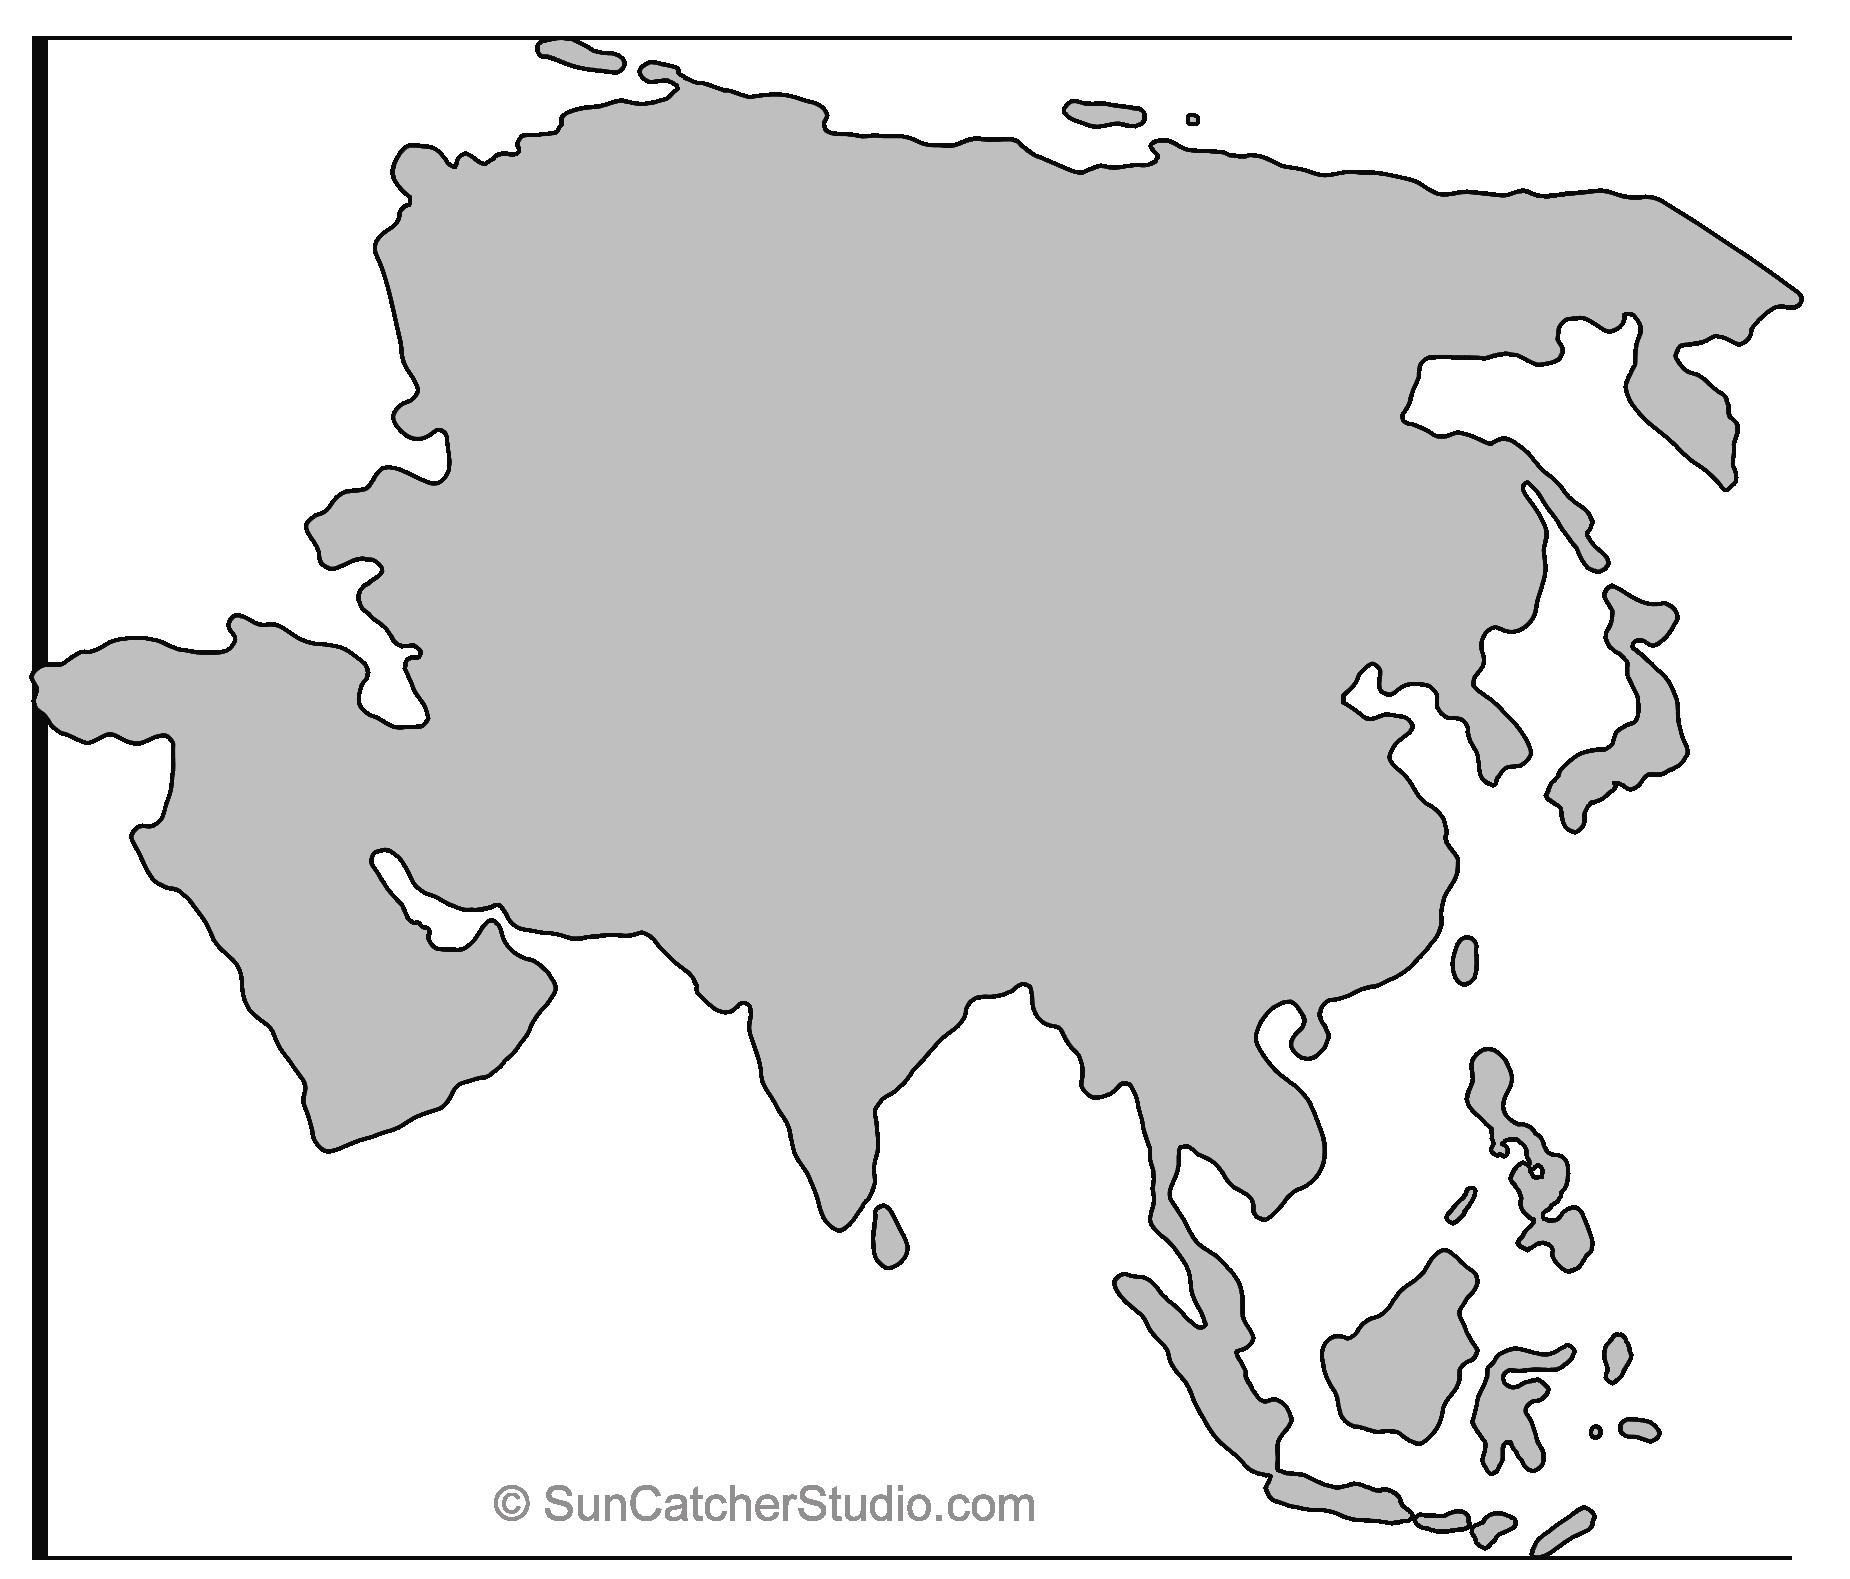 Asia Outline Pattern 1 850 1 579 Pixels